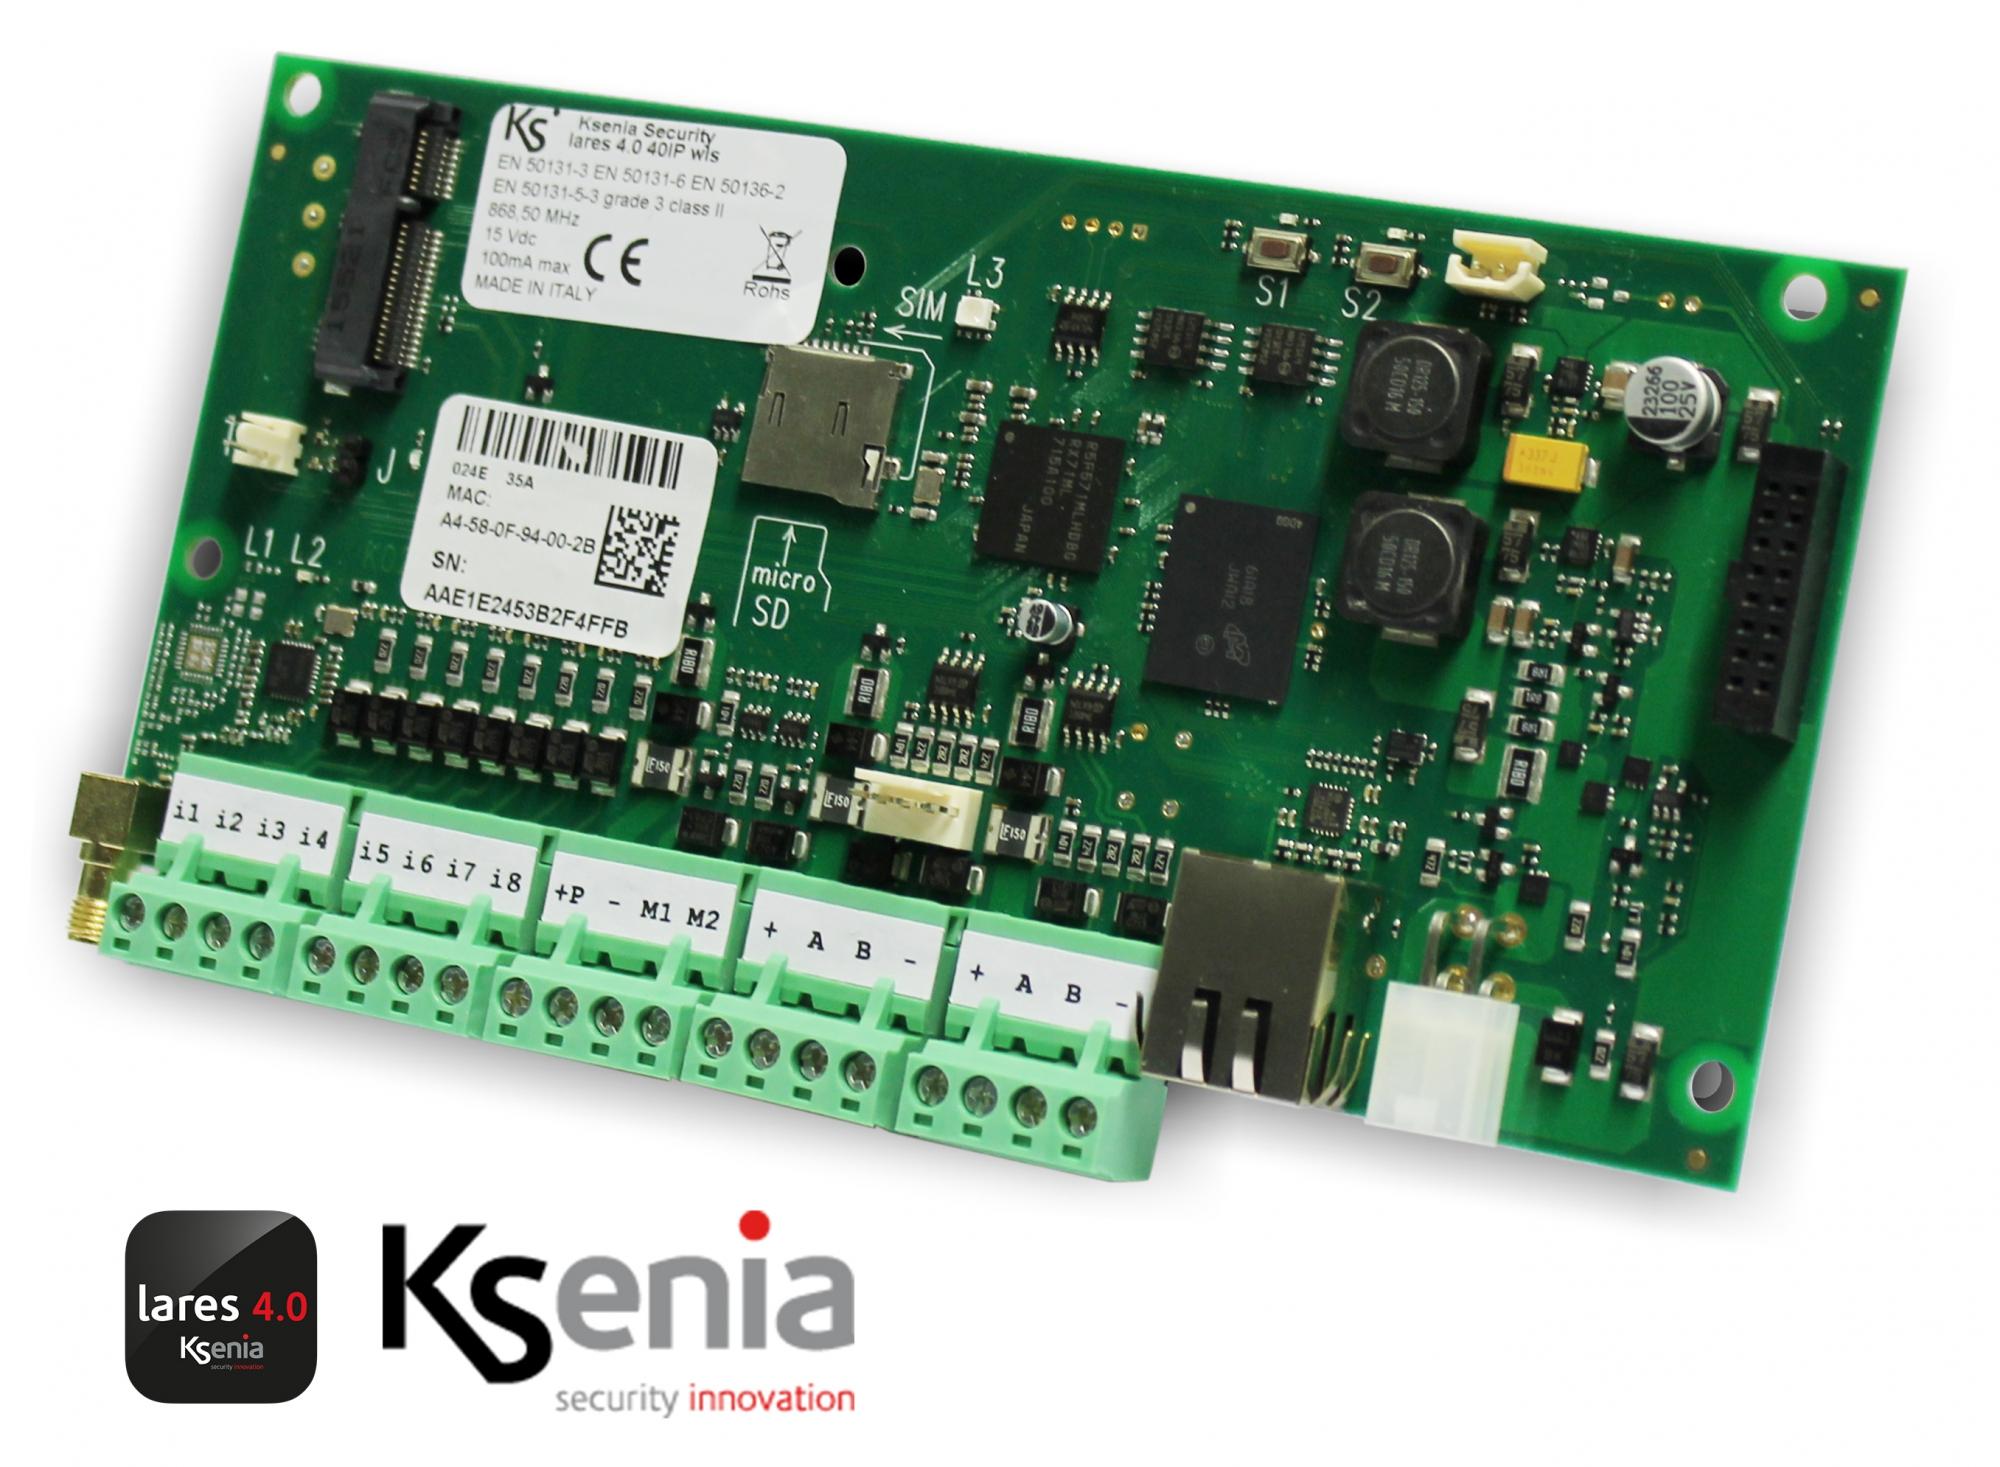 Ústredňa lares 4.0 40-IP s bezdrôtovou nadstavbou